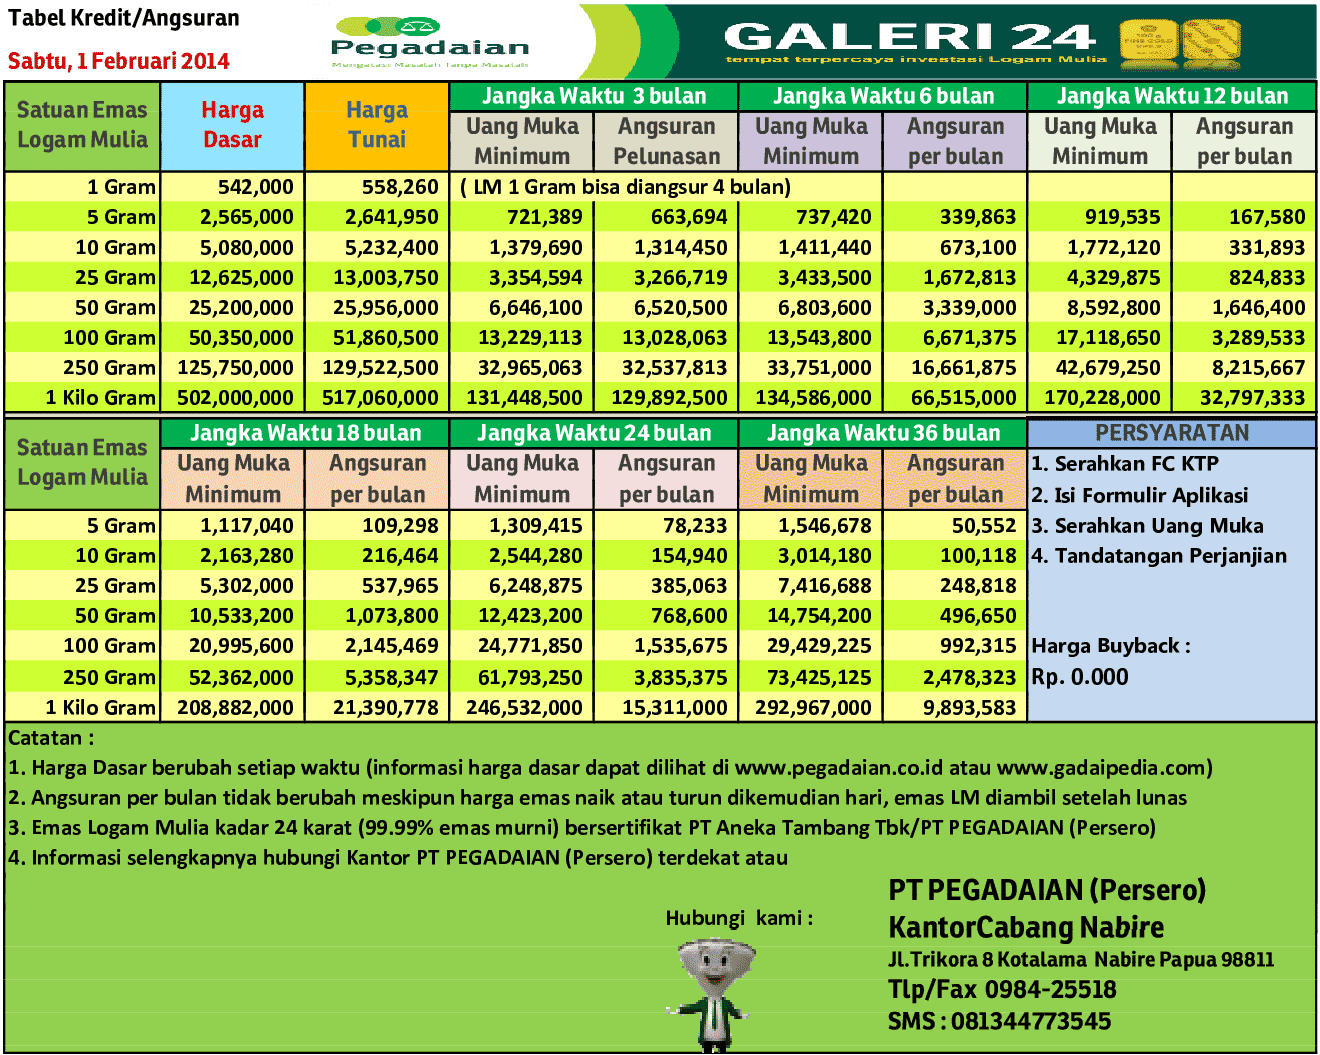 Seputar Pegadaian Harga Emas Dan Tabel Kredit Emas 1 2 Februari 2014